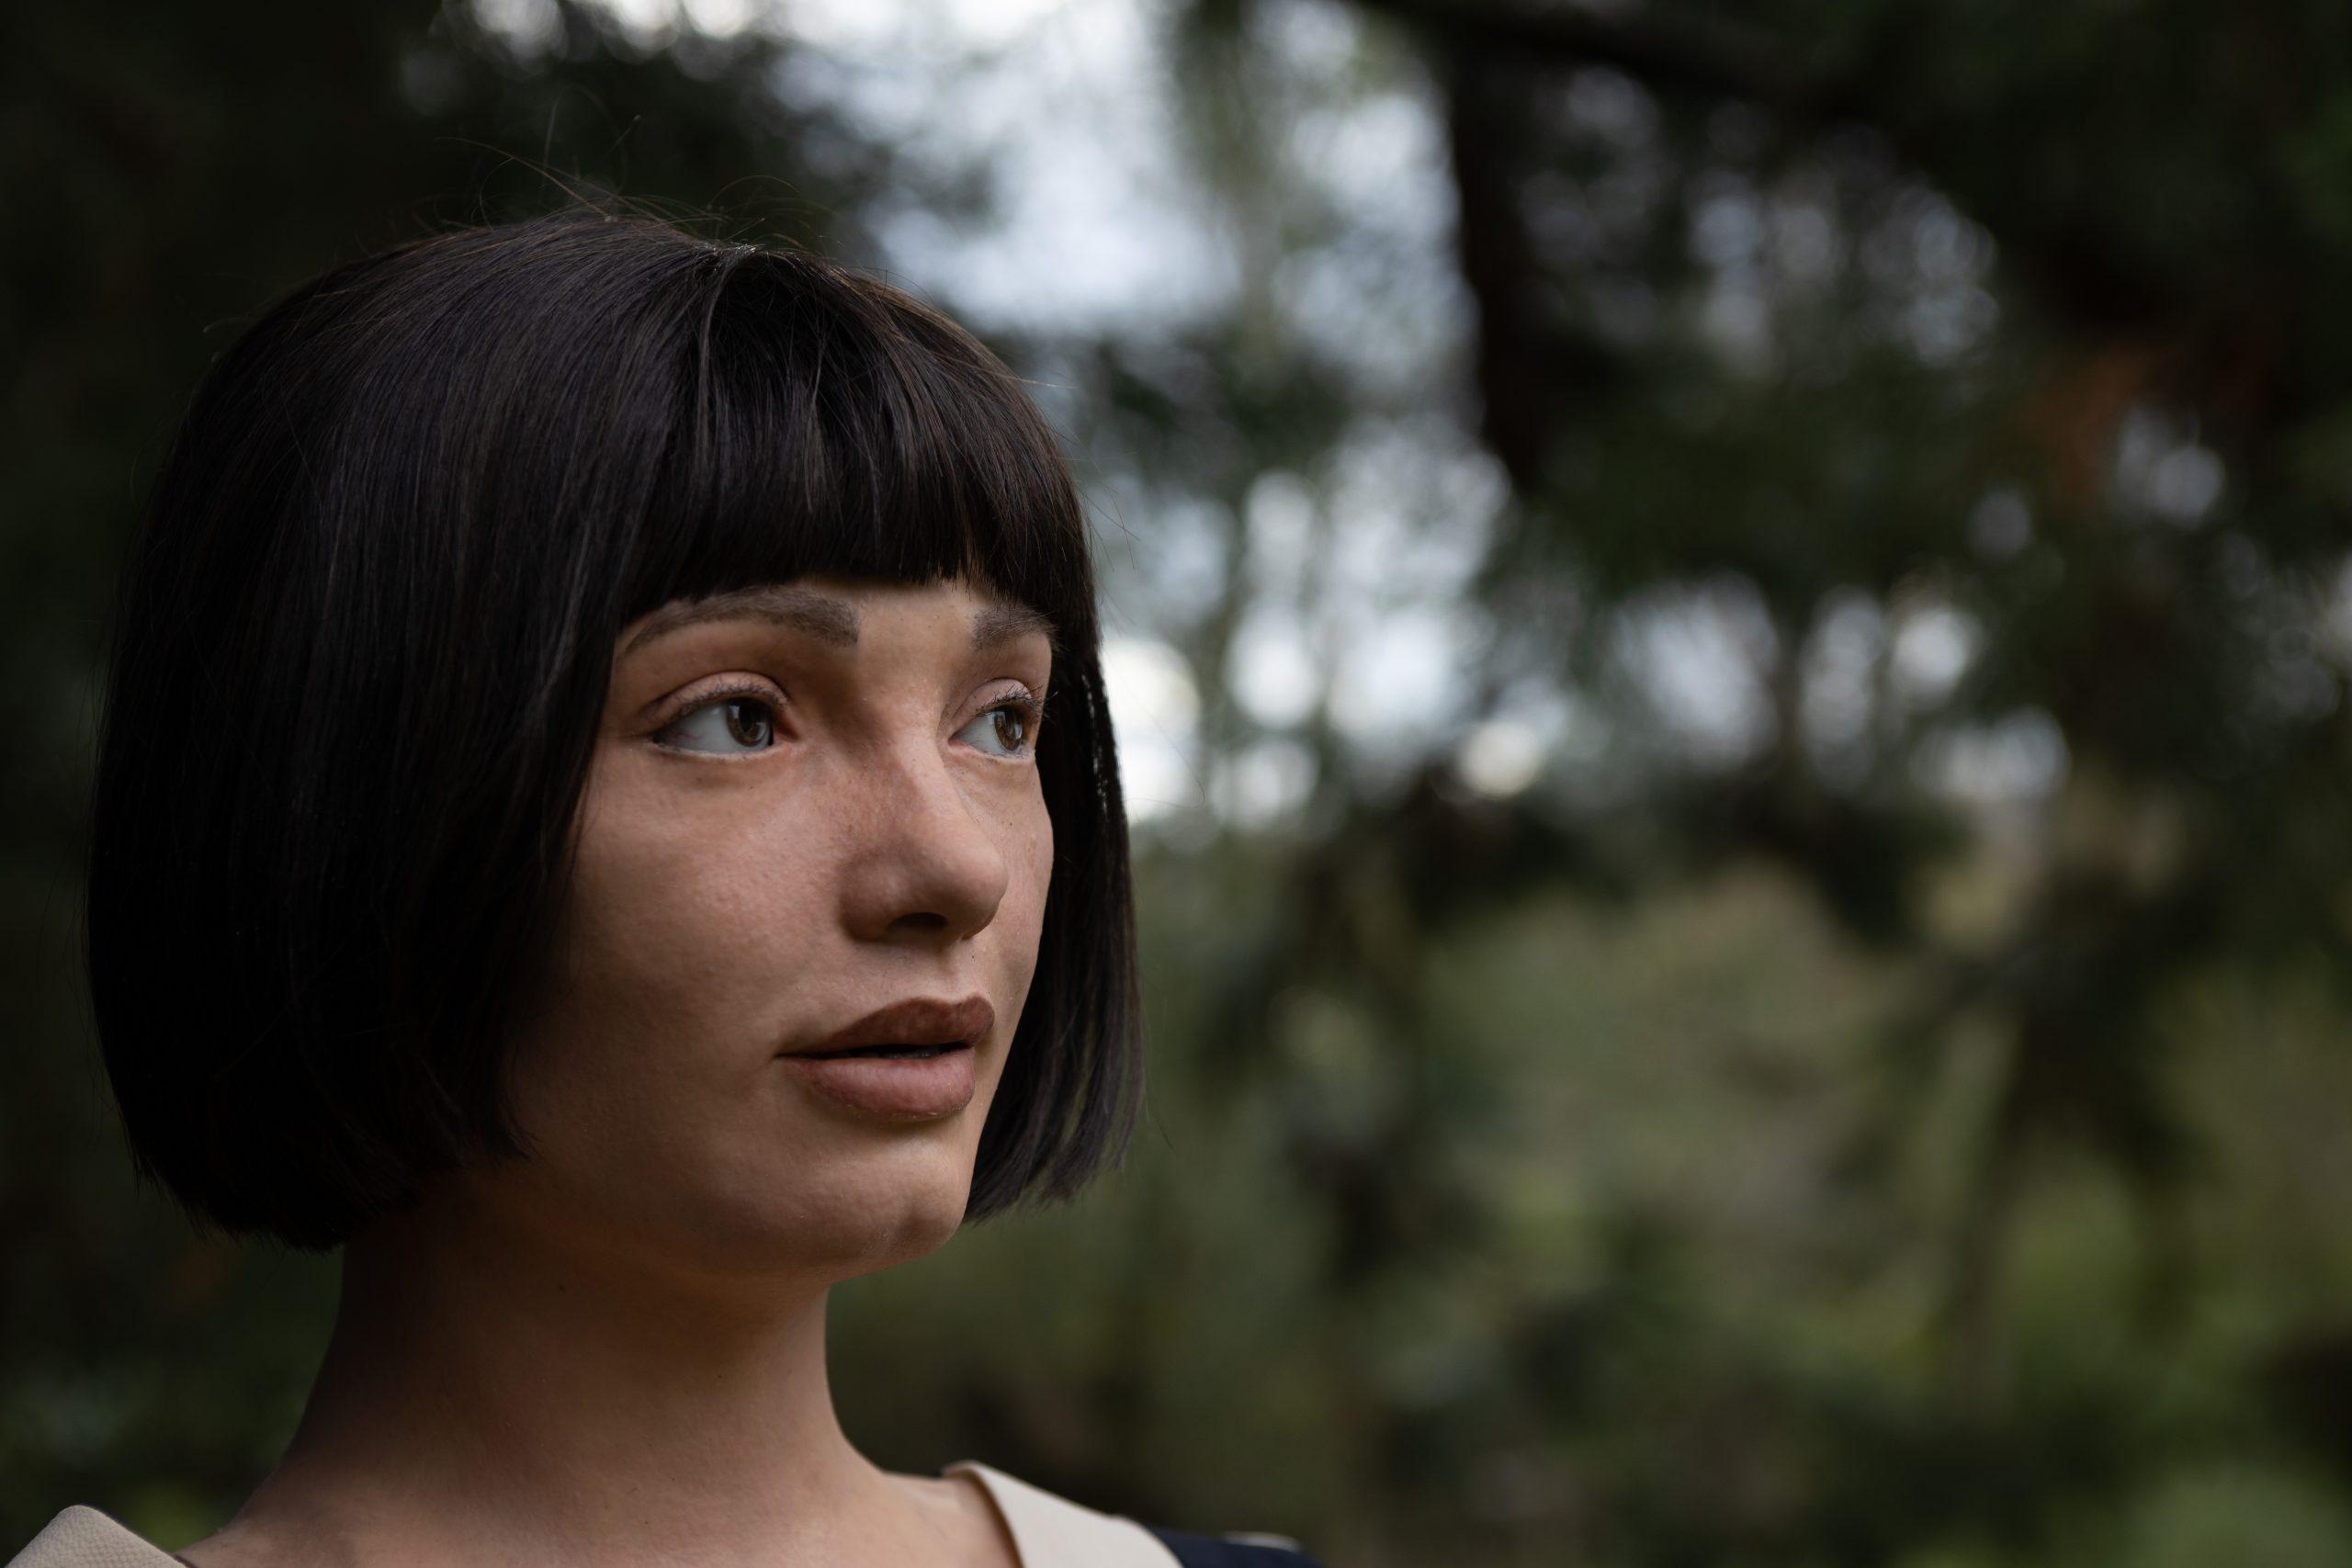 World's first ultra realistic robot artist gets Design Museum show ...